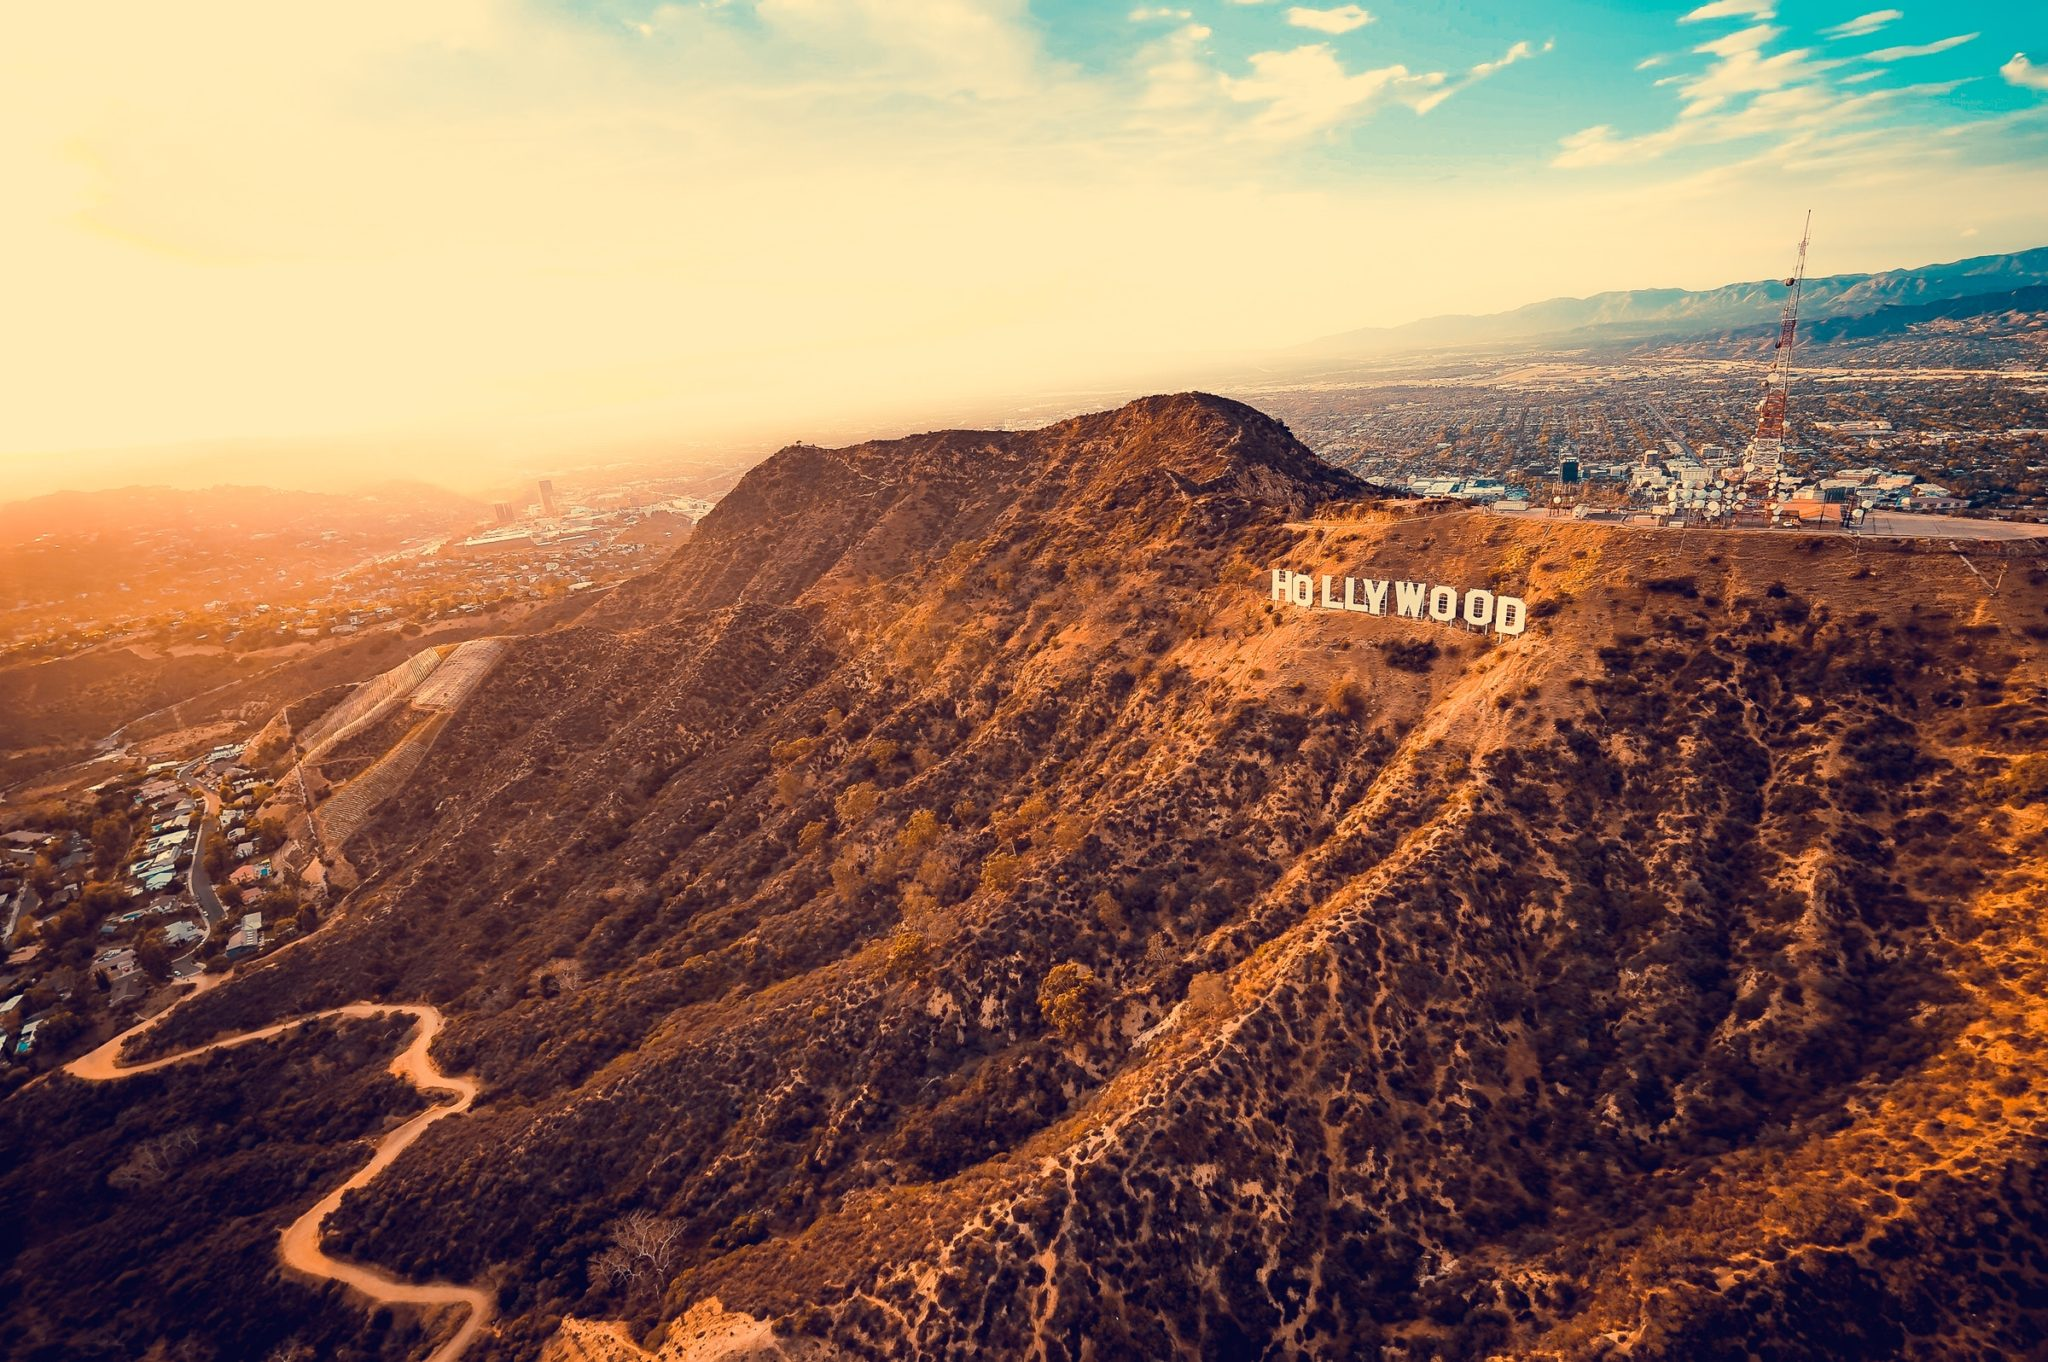 Letecký pohled na Hollywood